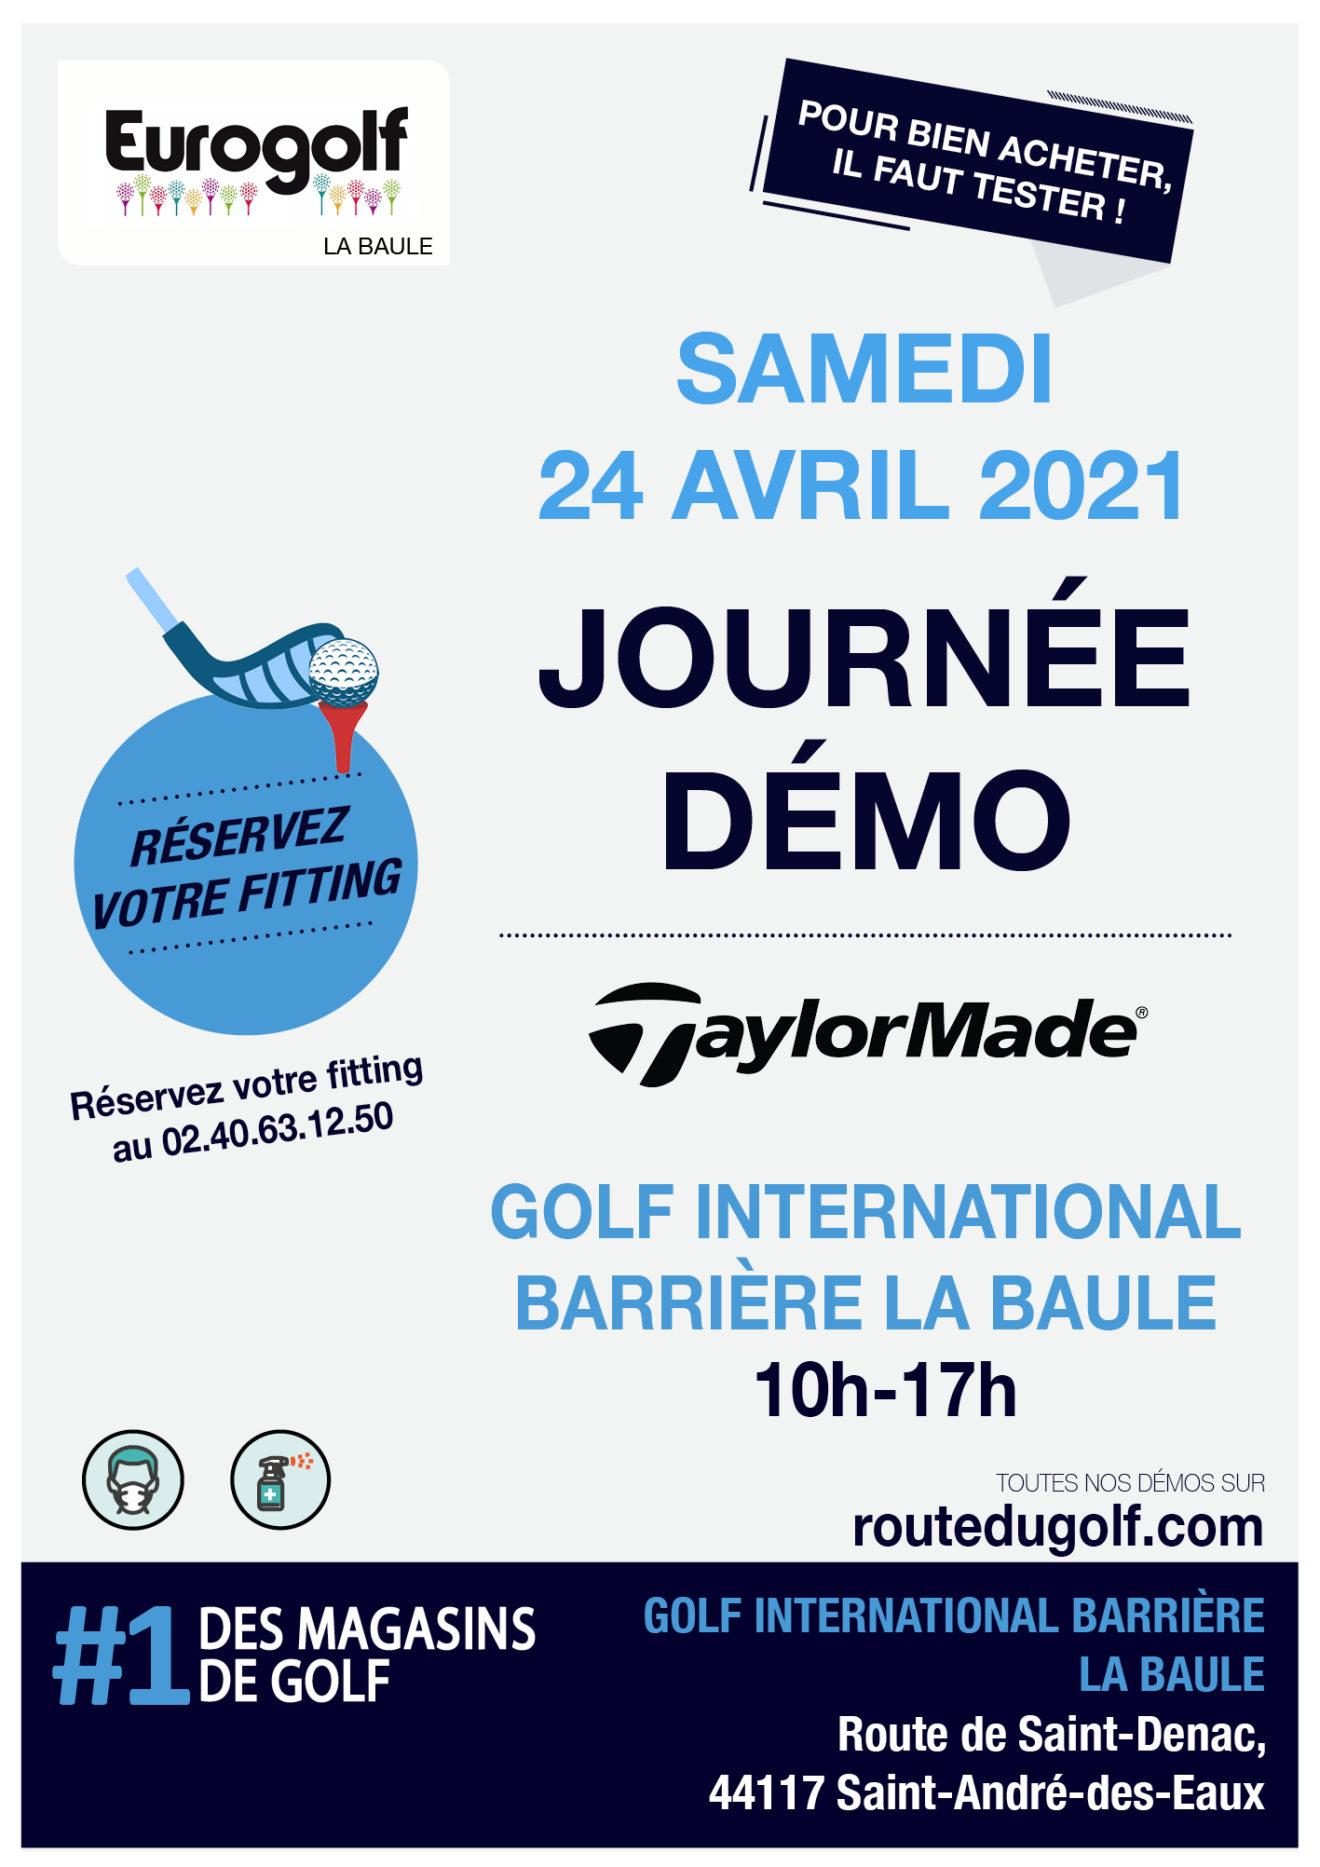 Démo_TM_Labaule_24Avril